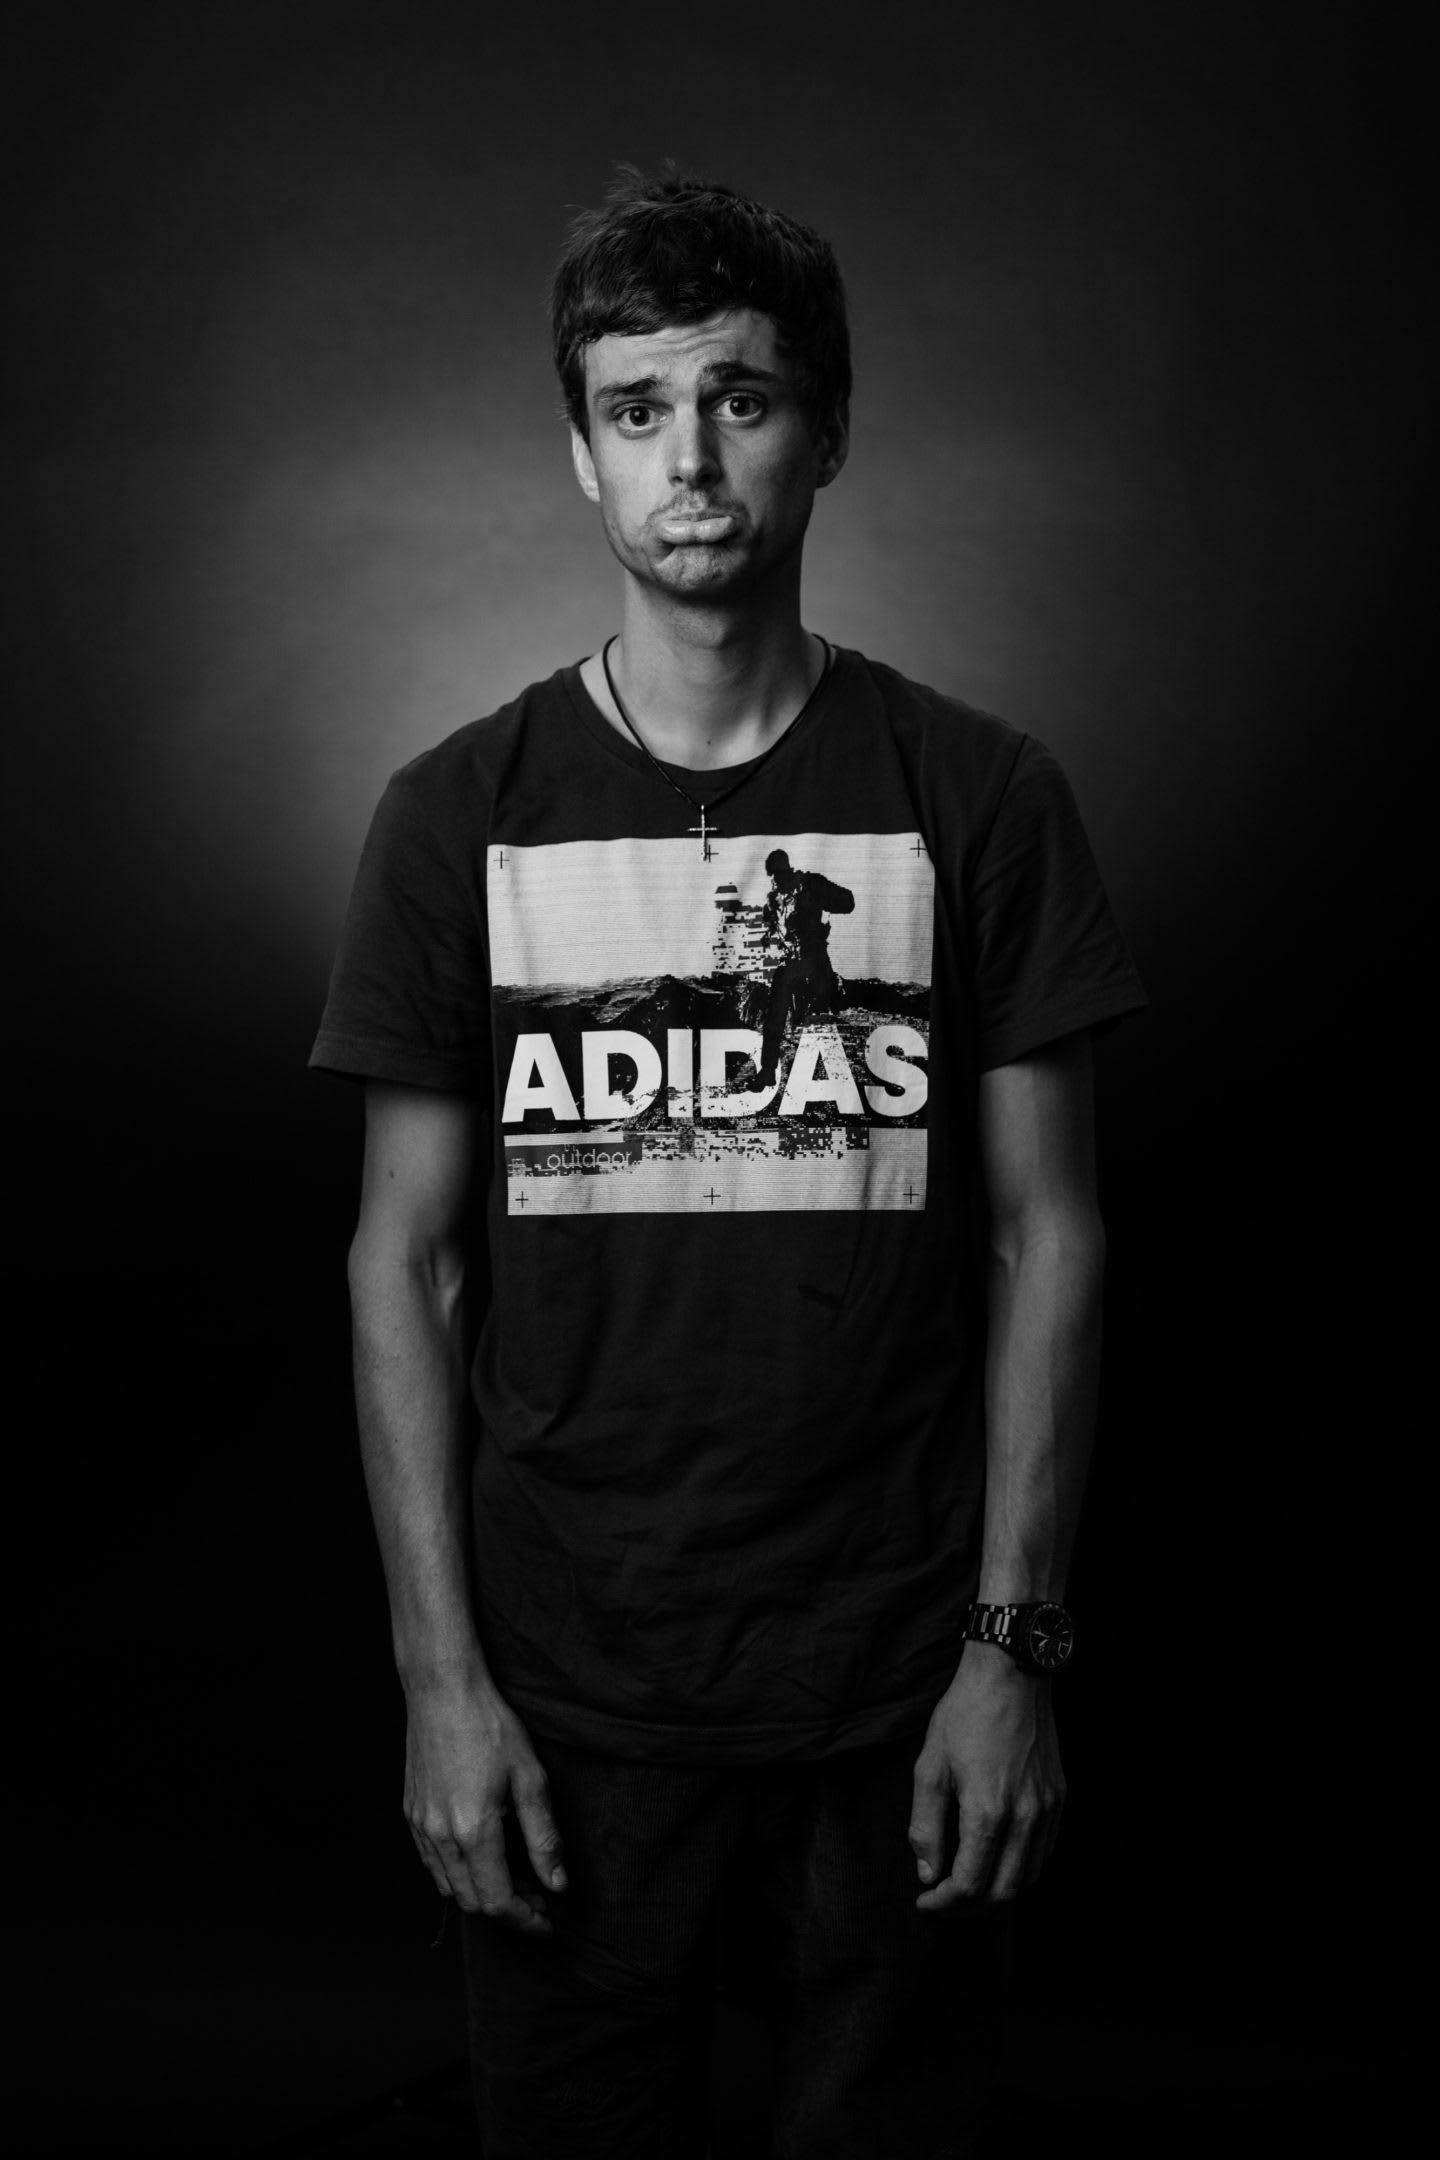 Toni-Palzer-adidas-Terrex-athlete-life-without-mountains-gesture